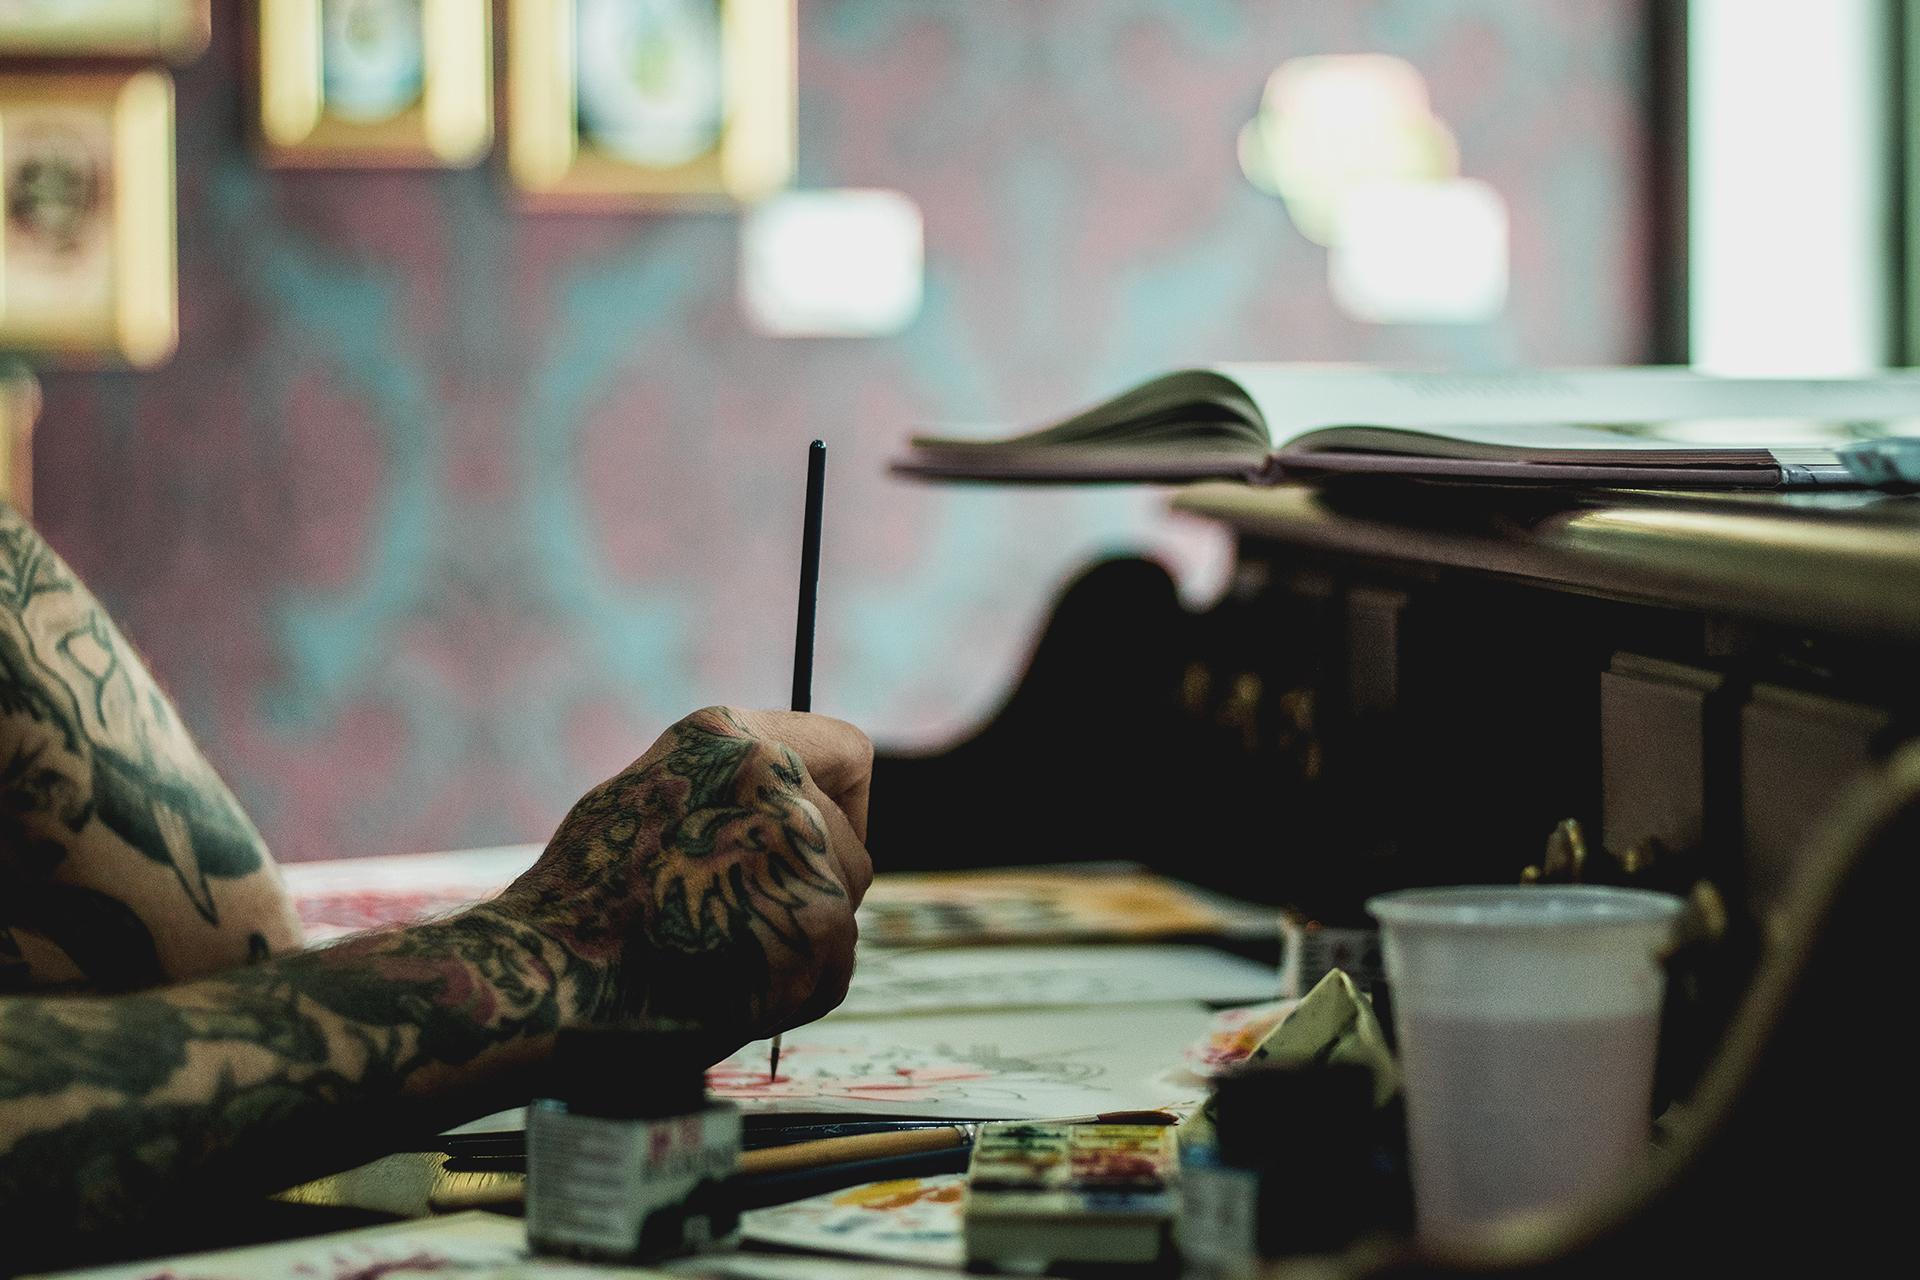 studio di tatuaggi roma nuovo salario